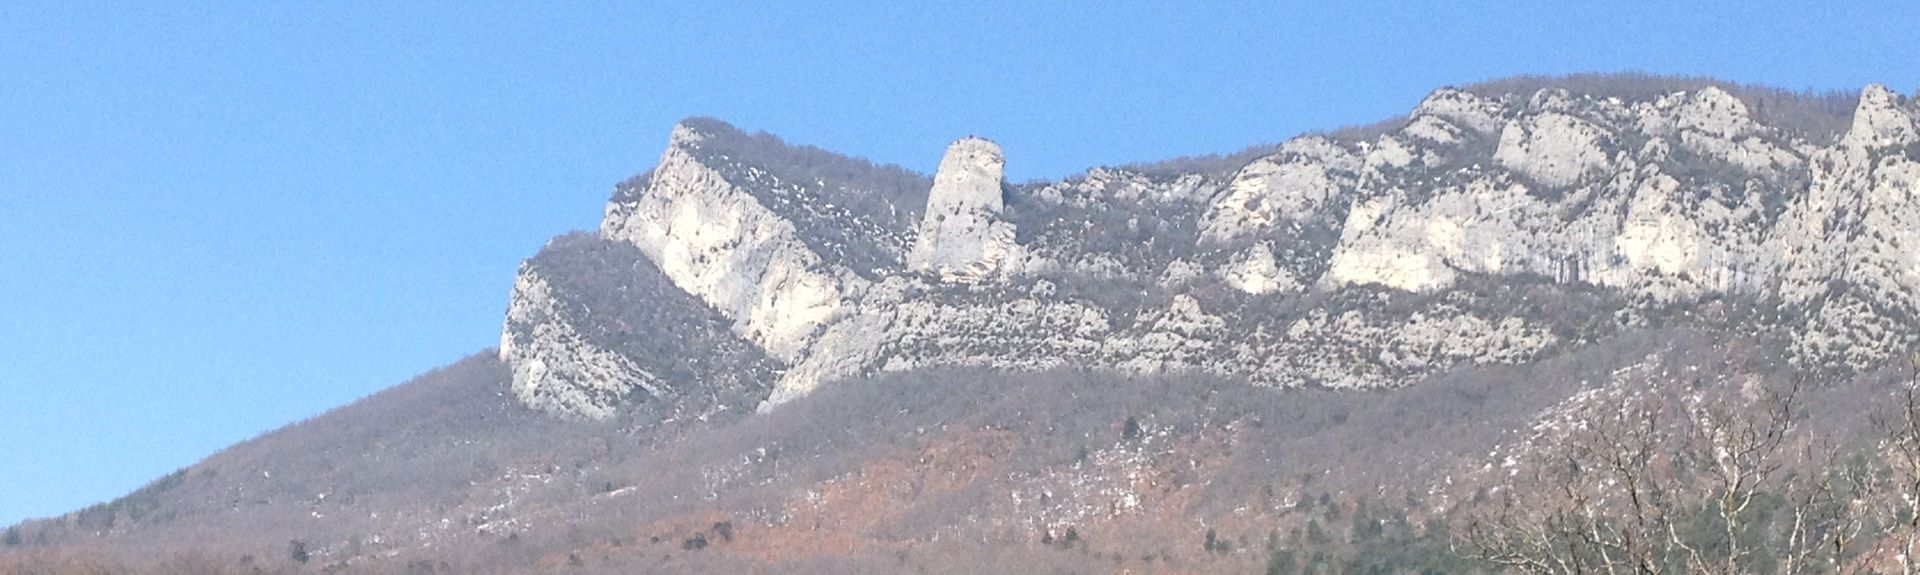 Ambonil, Auvergne-Rhône-Alpes, Francja